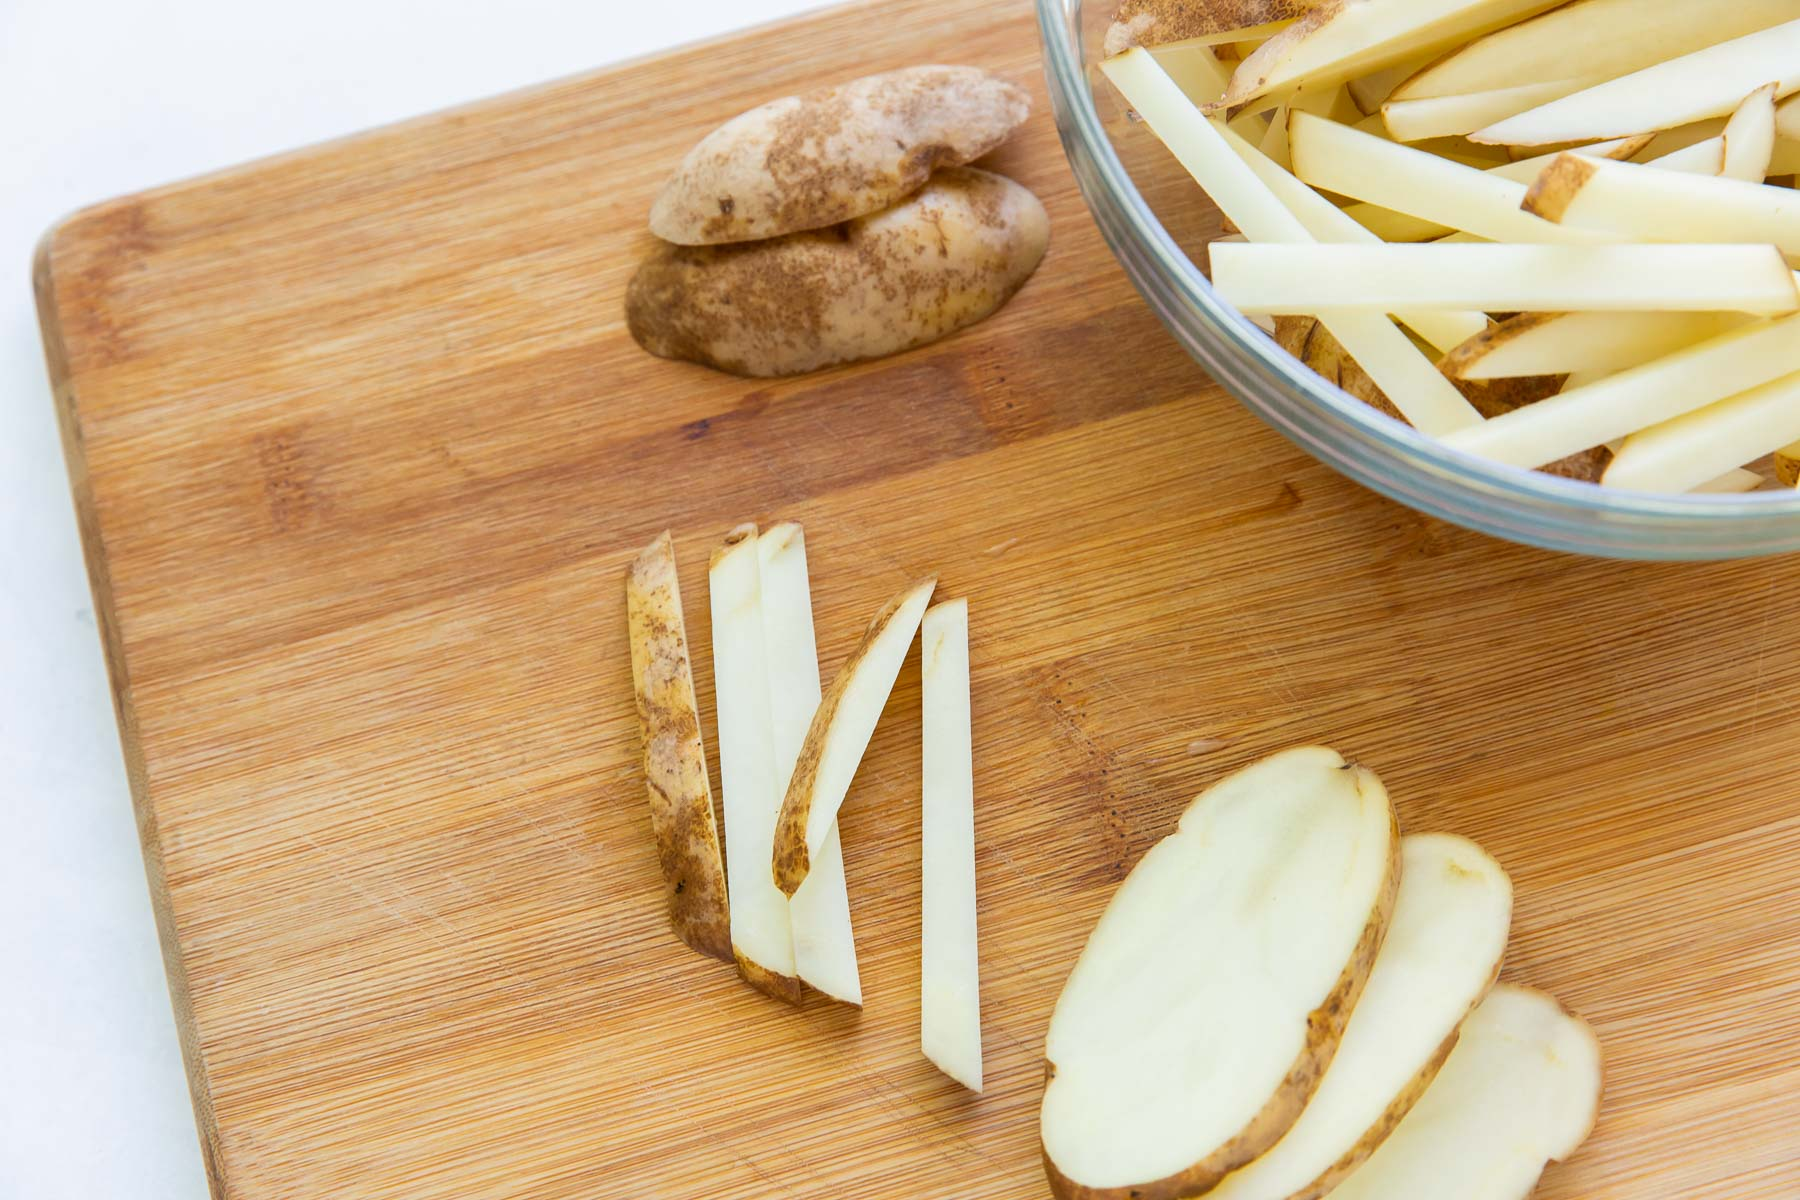 cutting a potato into 1/4-inch thick sticks